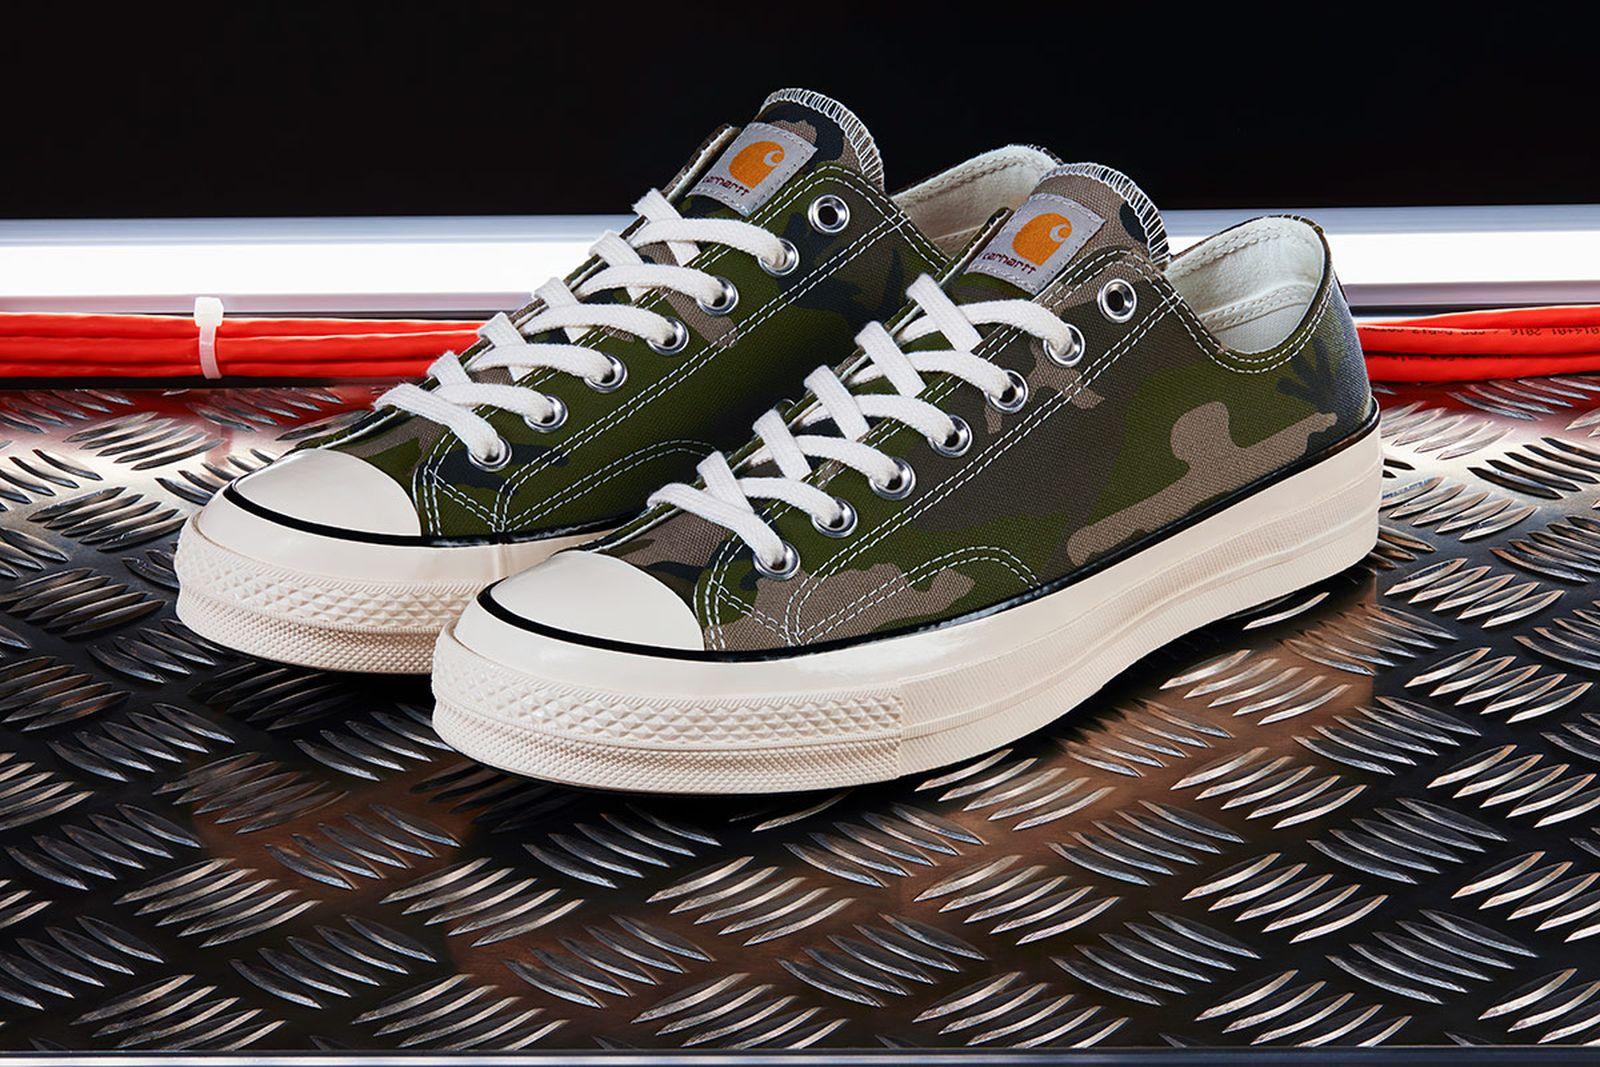 carhartt wip converse chuck 70 low release date price